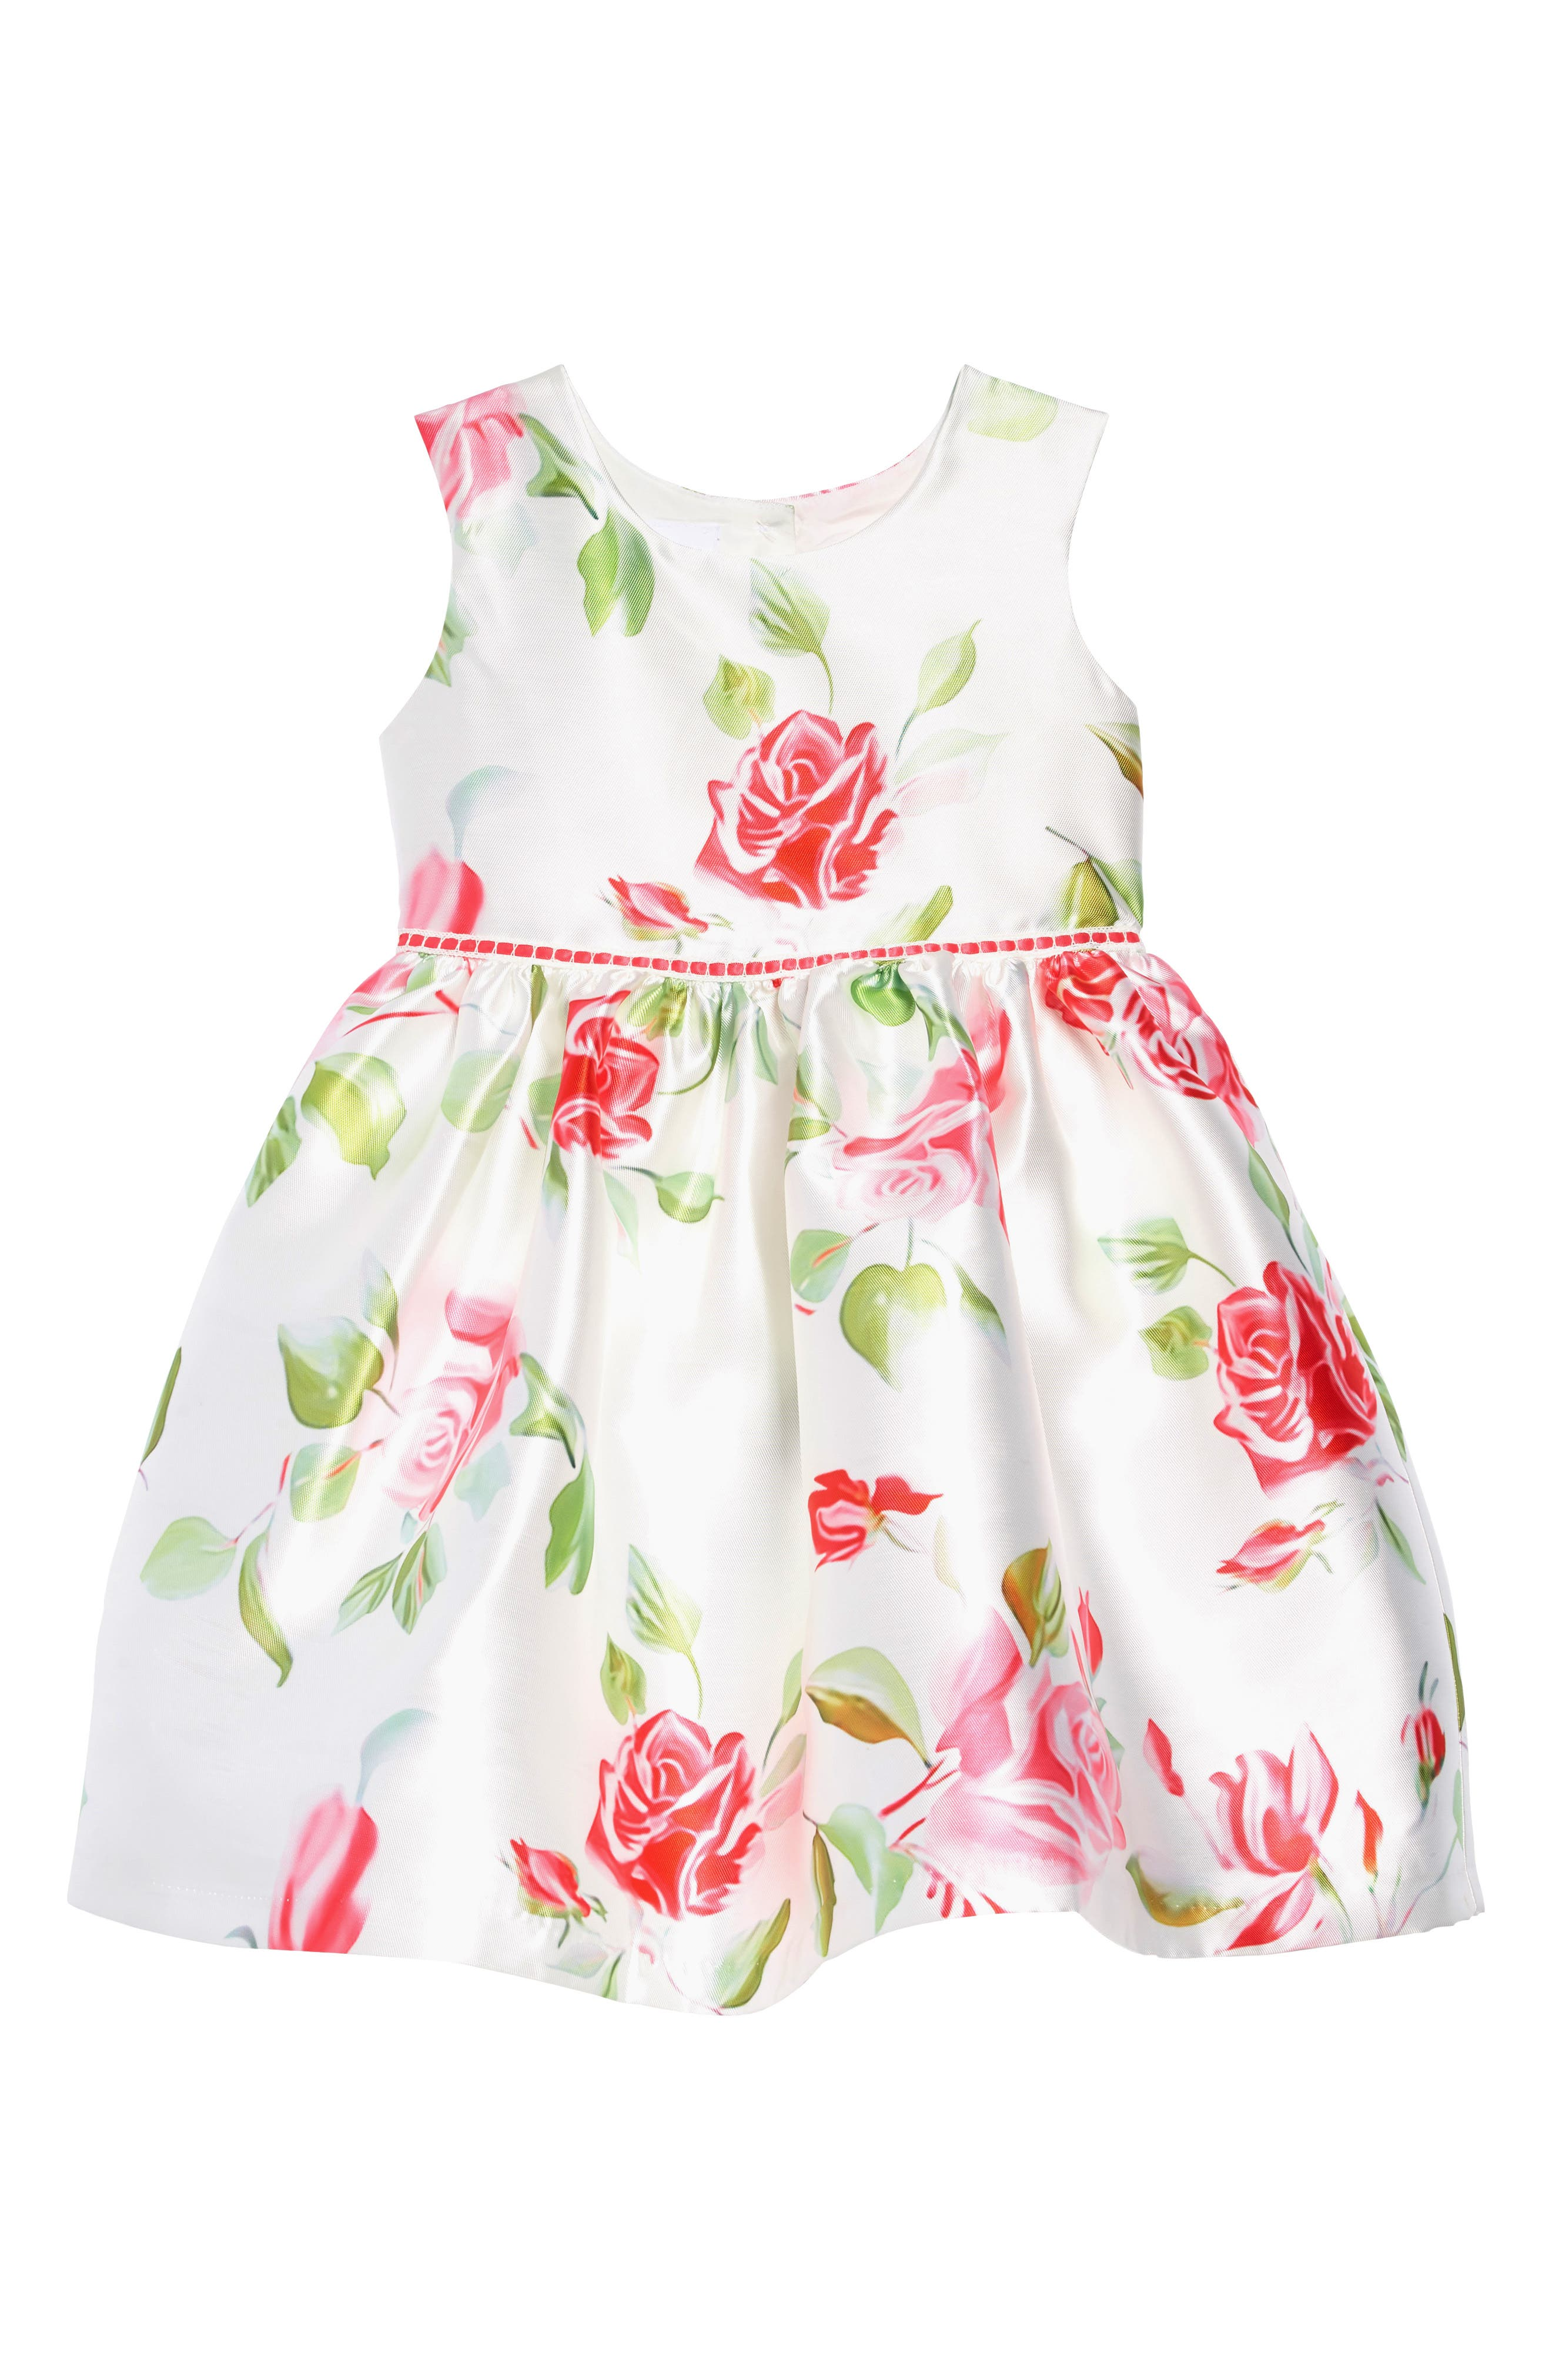 FRAIS, Rose Garden Fit & Flare Dress, Main thumbnail 1, color, WHITE / PINK